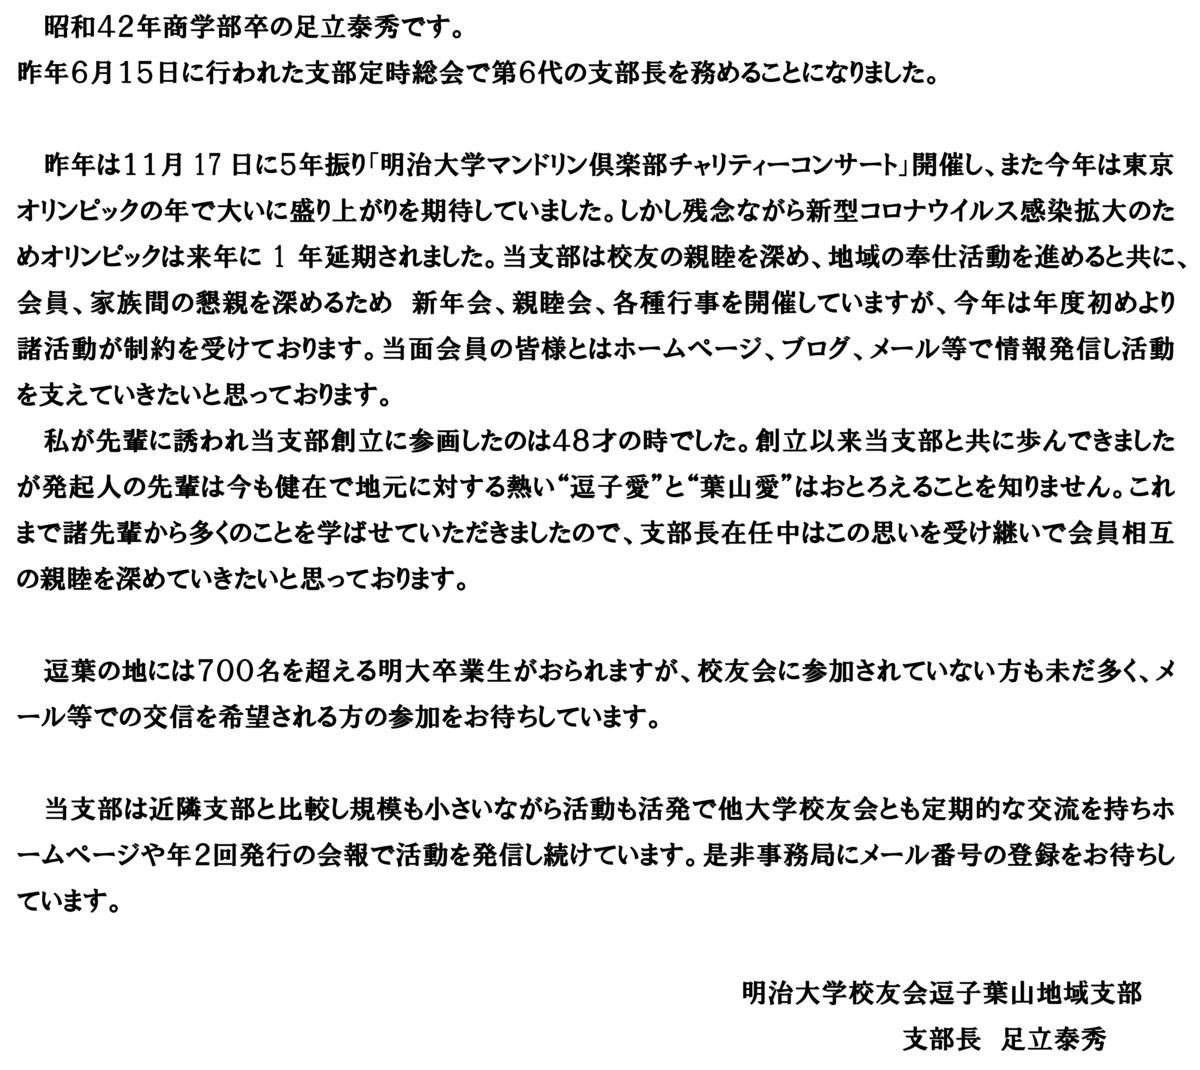 f:id:meijizuyou:20200507225706p:plain